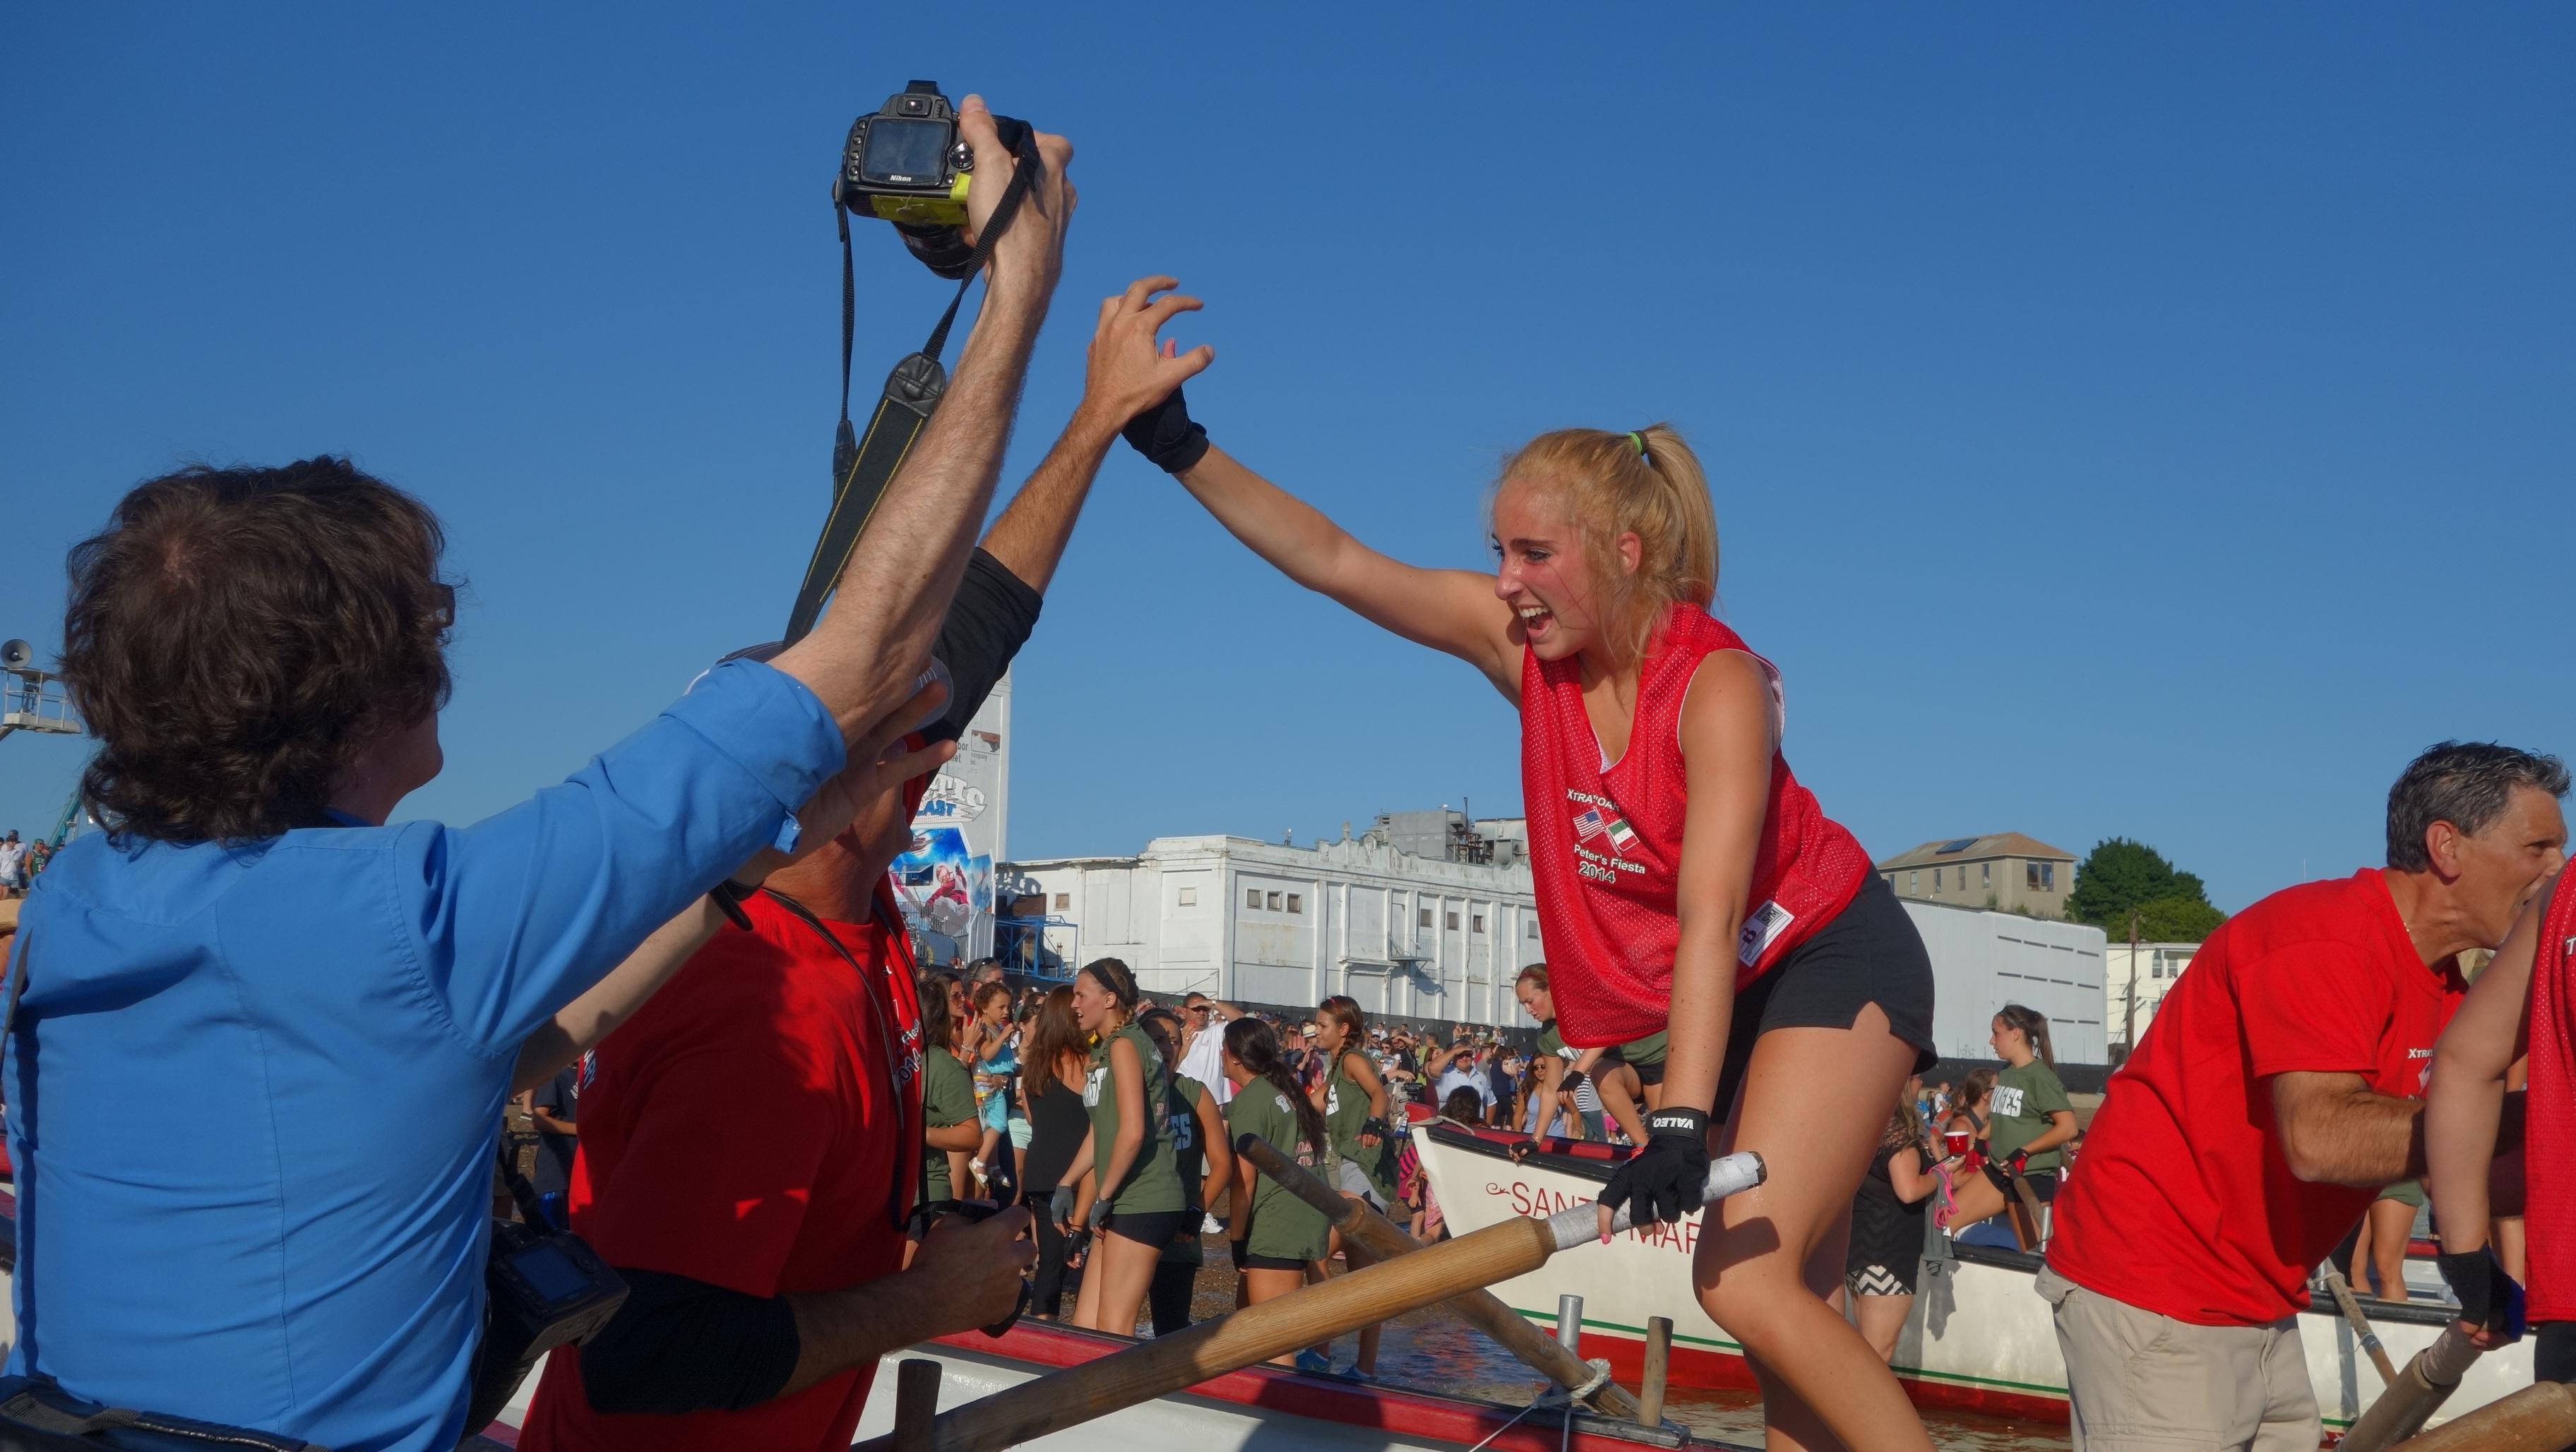 Amanda Race St. Peter's Fiesta 2014 Camps! 196